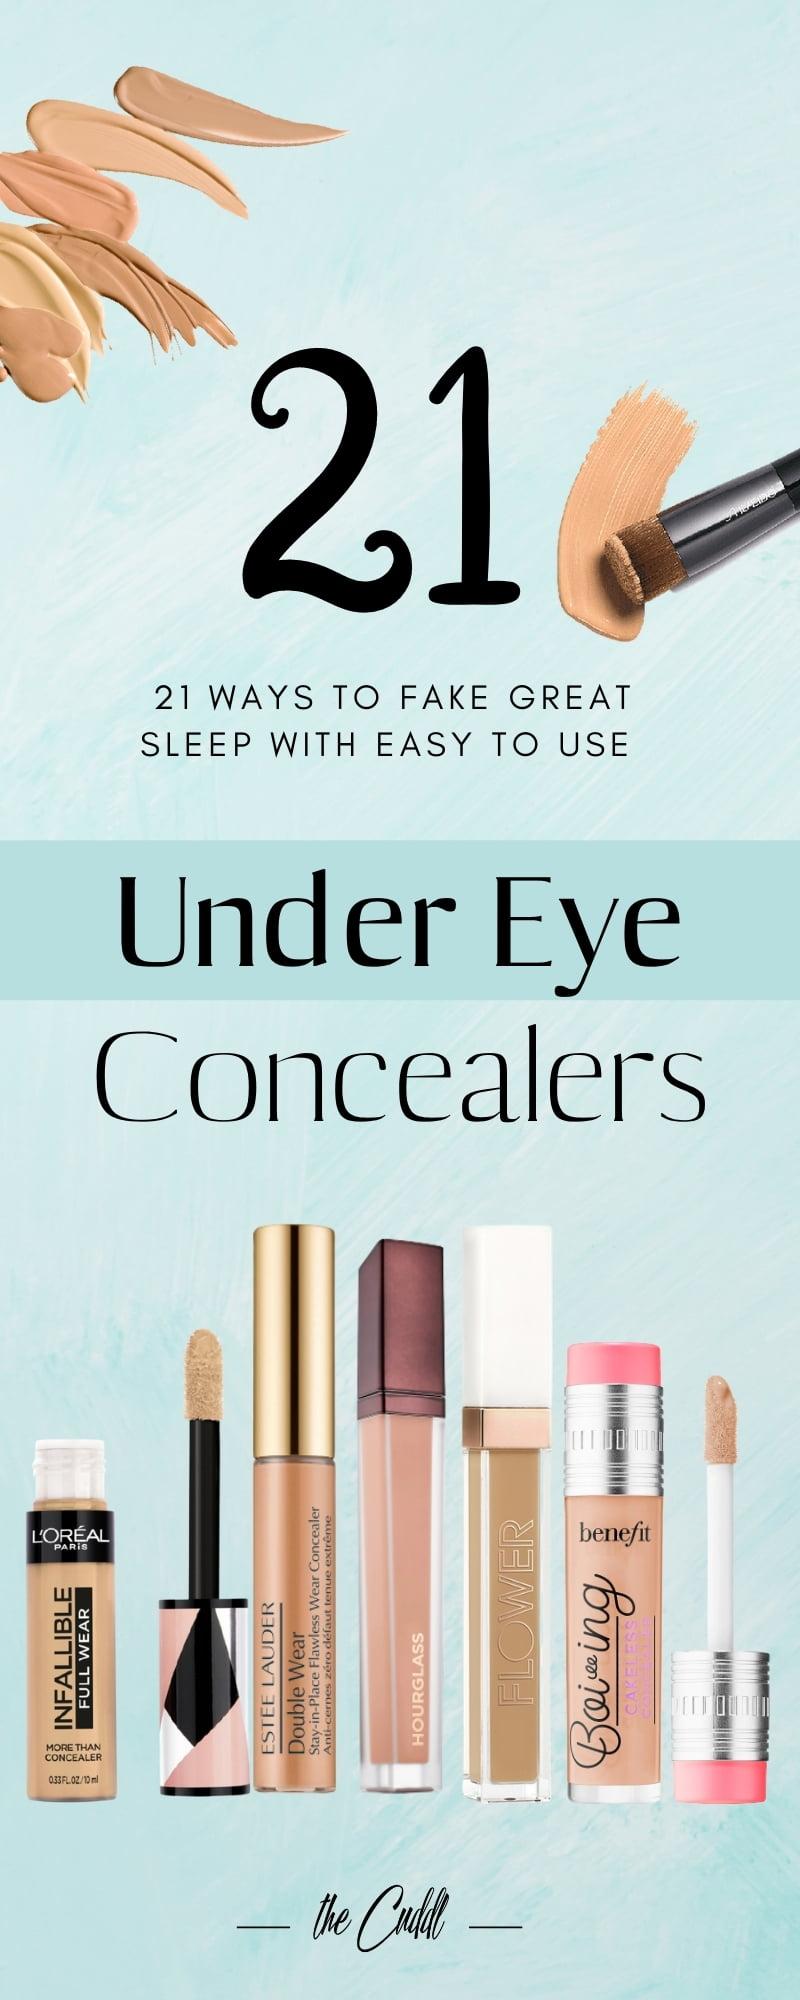 Best Under Eye Concealers for Dark Circles